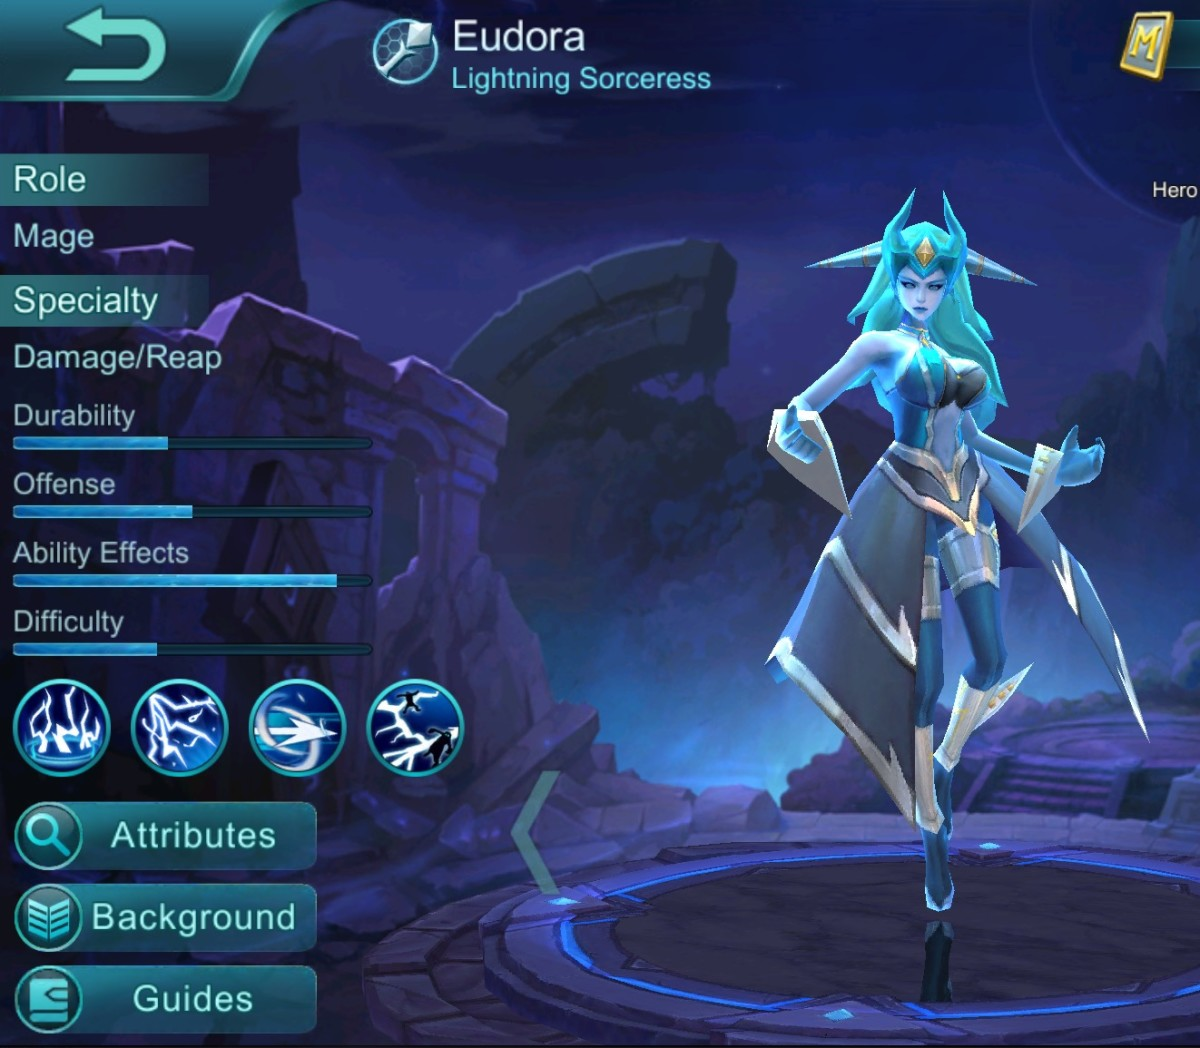 Eudora, Copyright Moonton